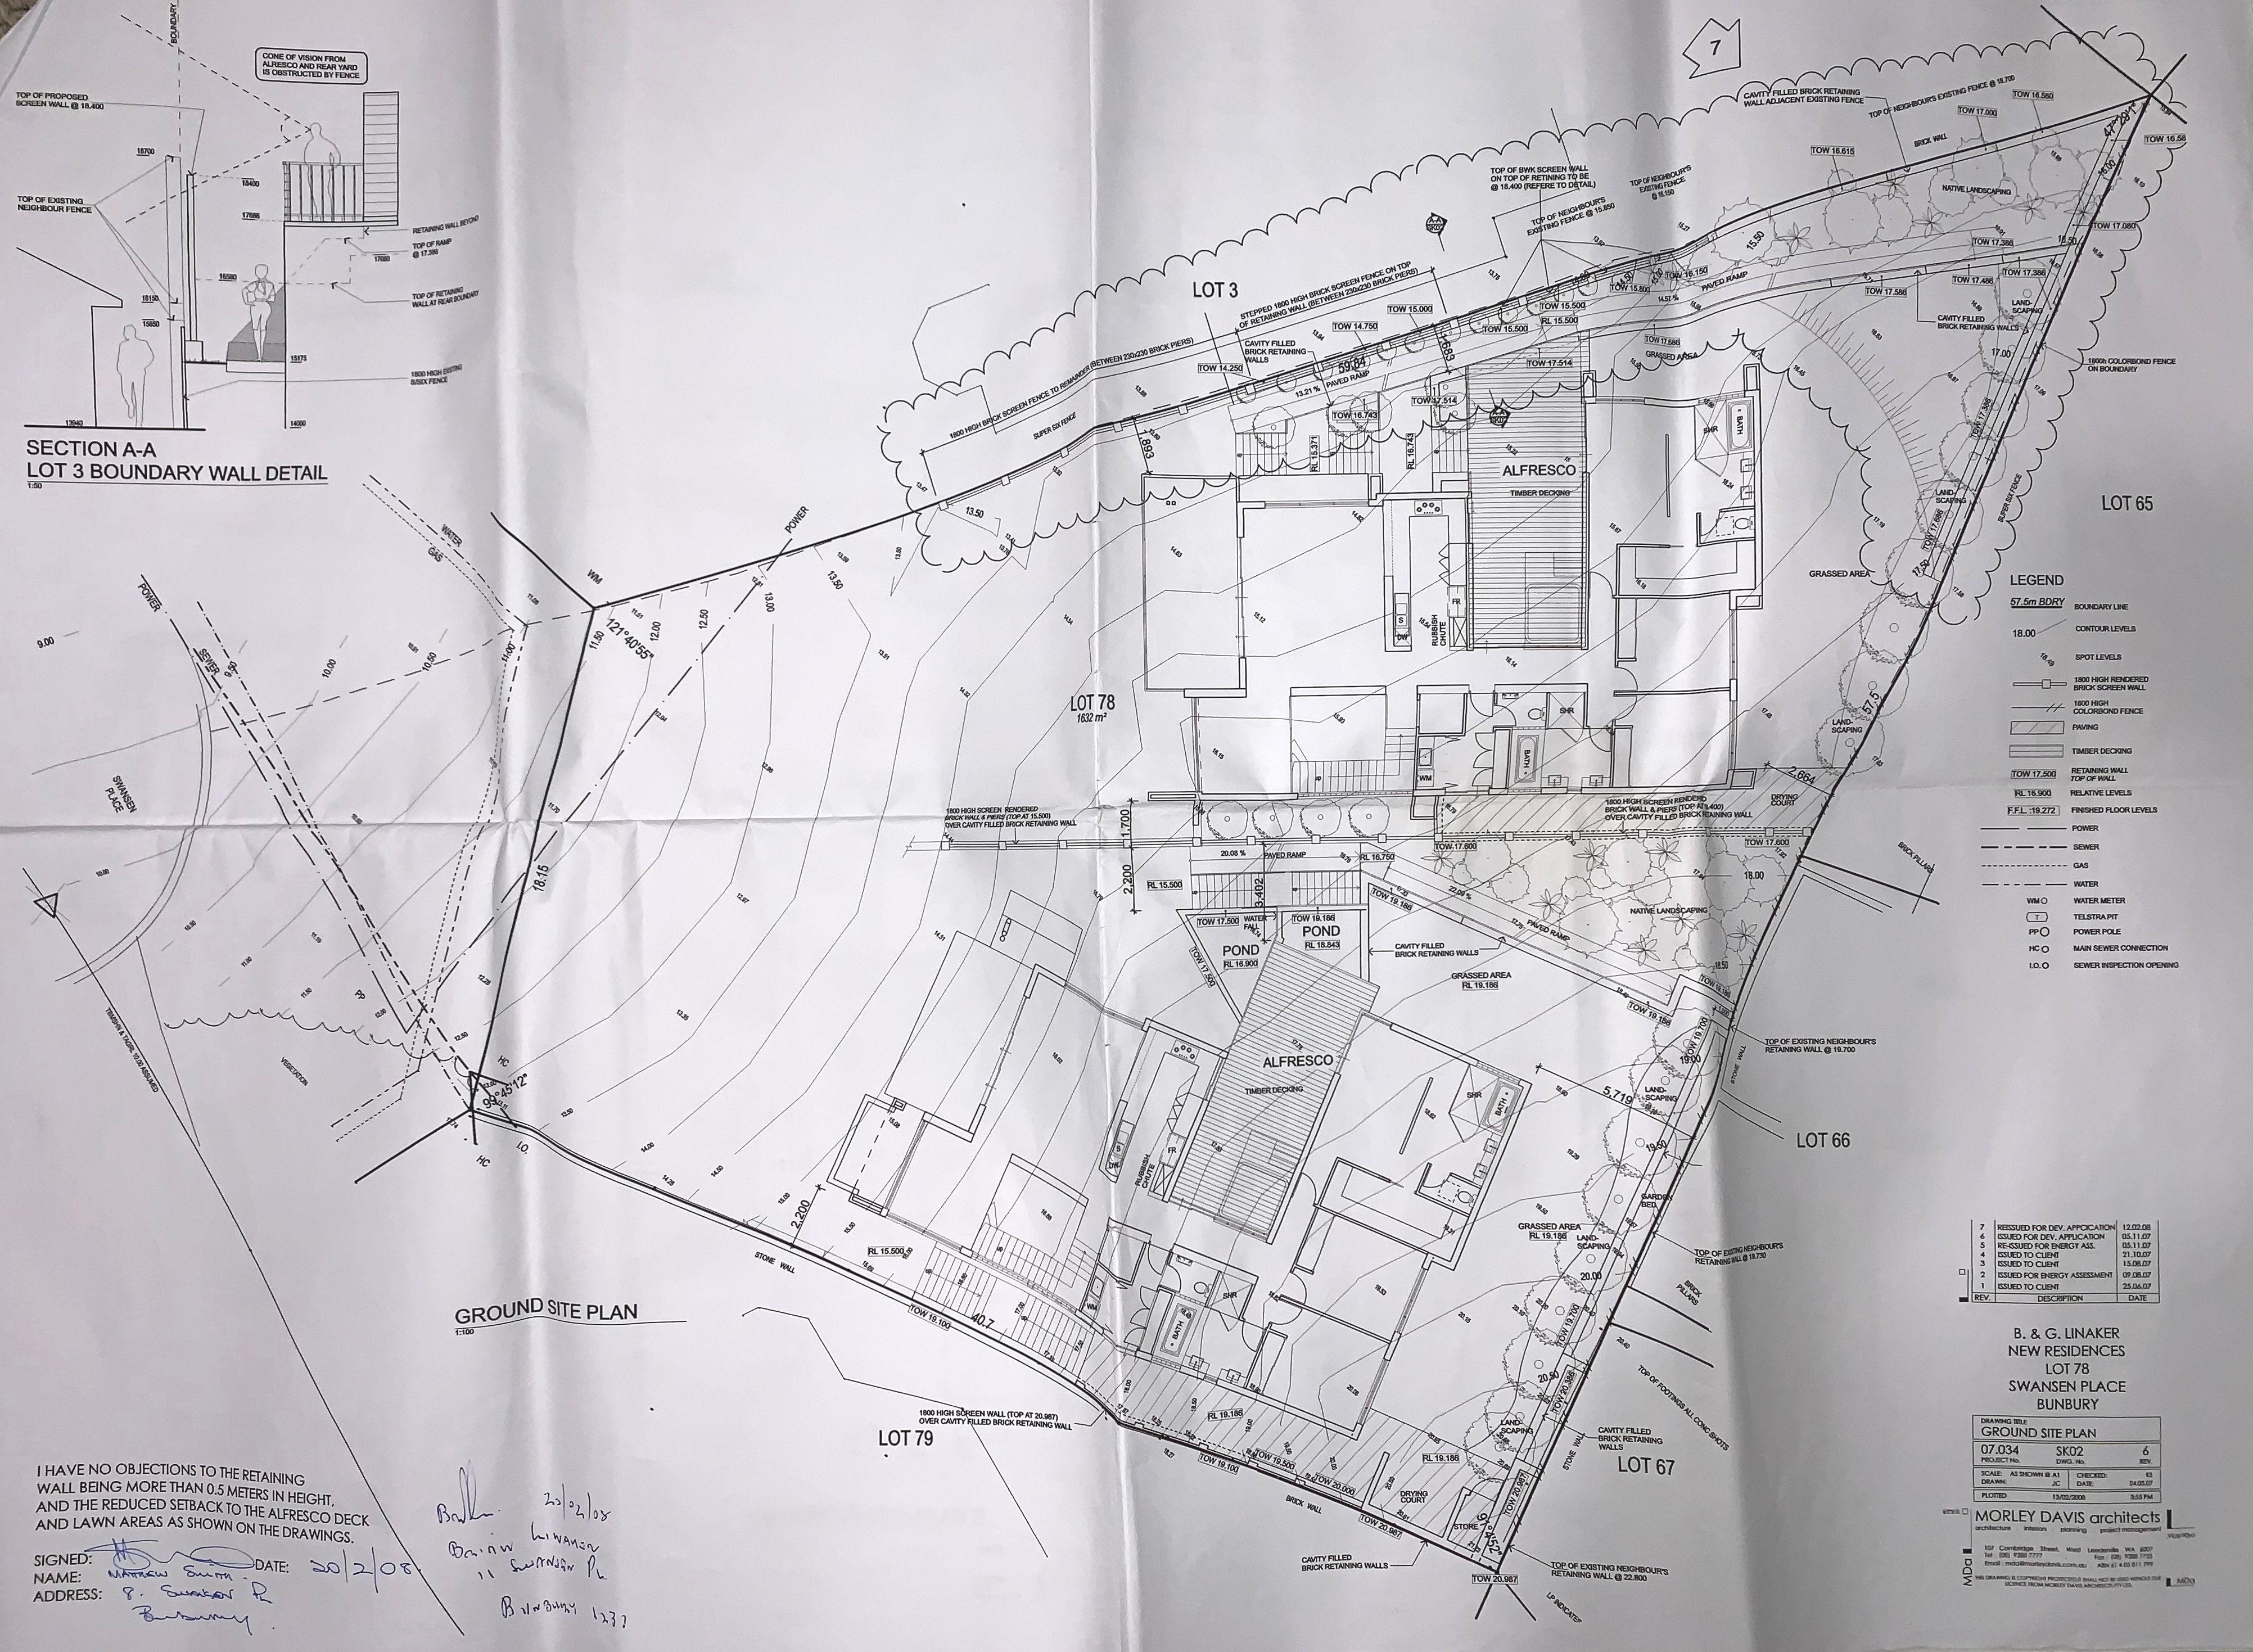 12 Swansen Place, Bunbury